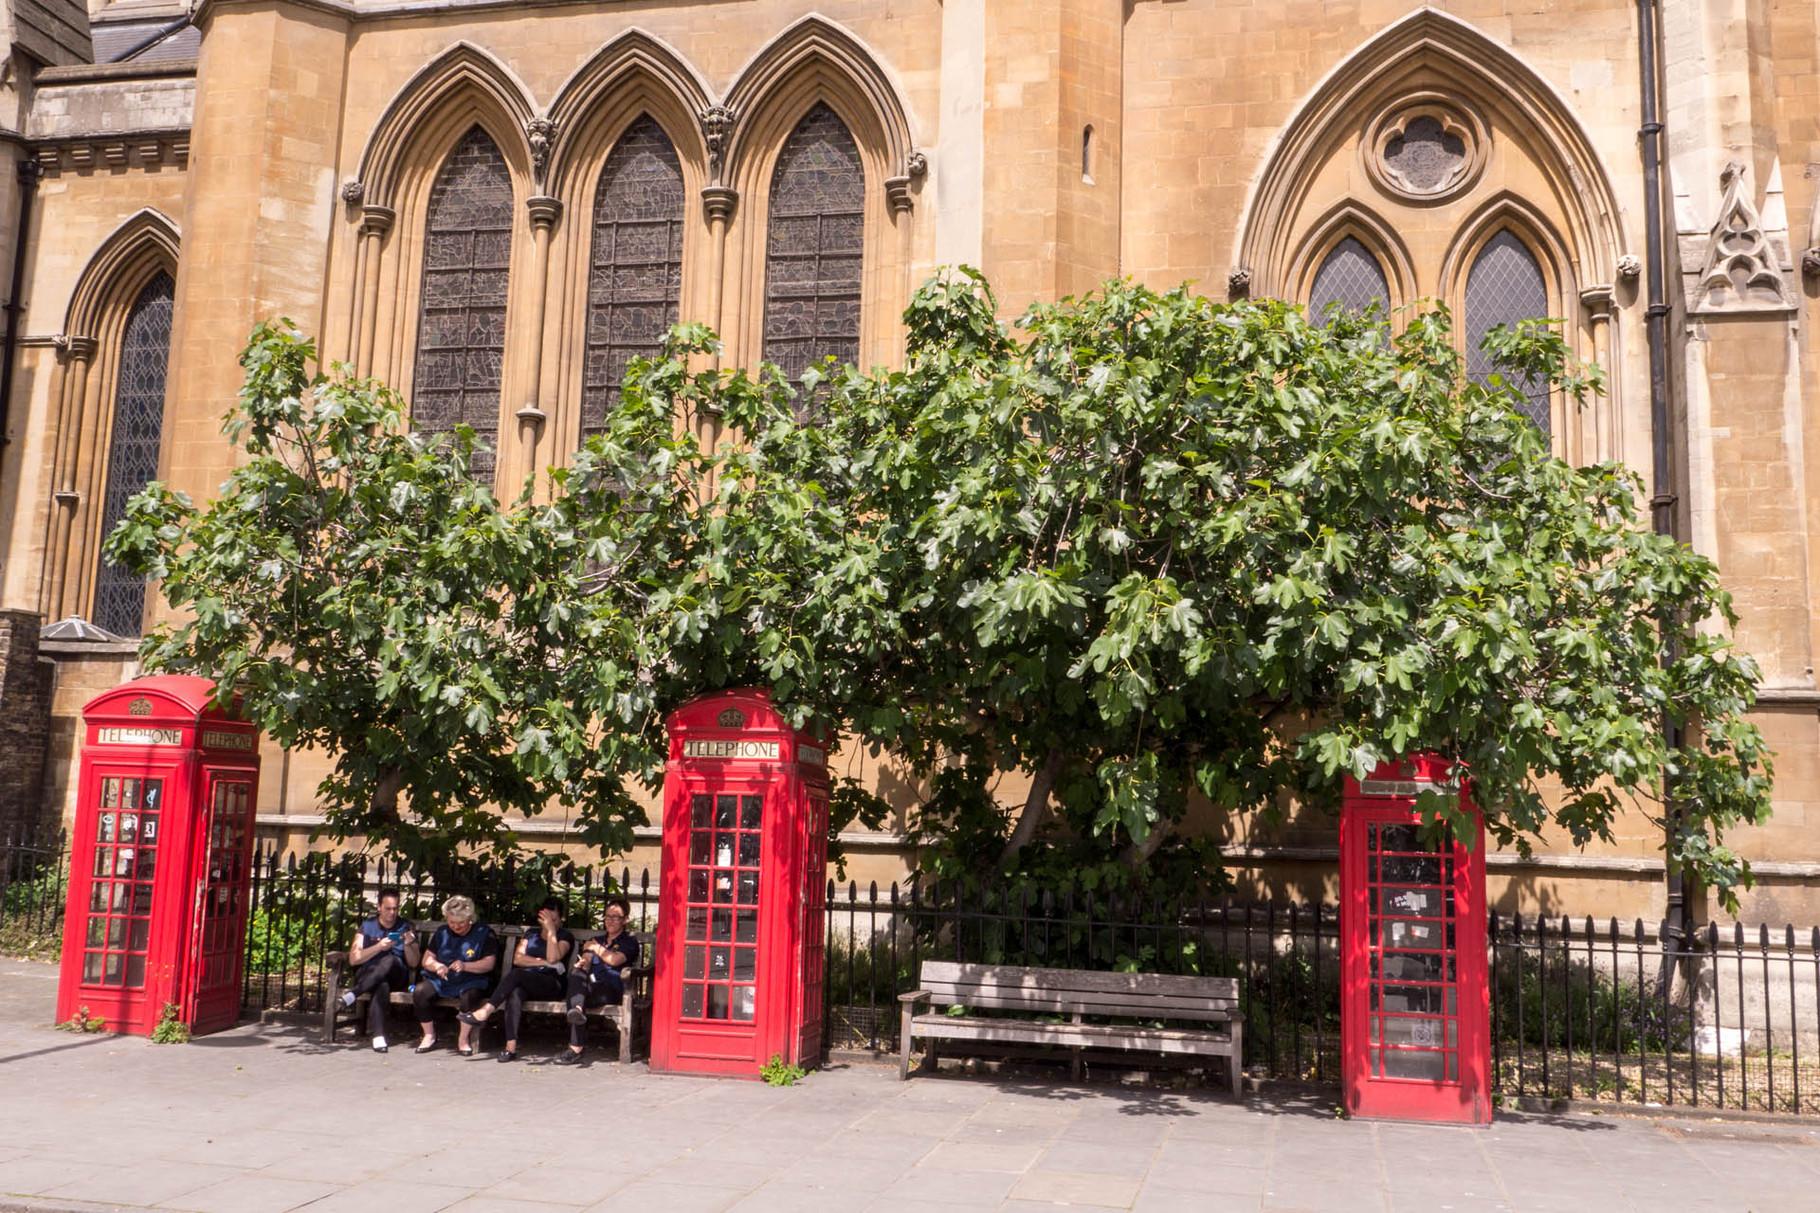 Telephon booths, London